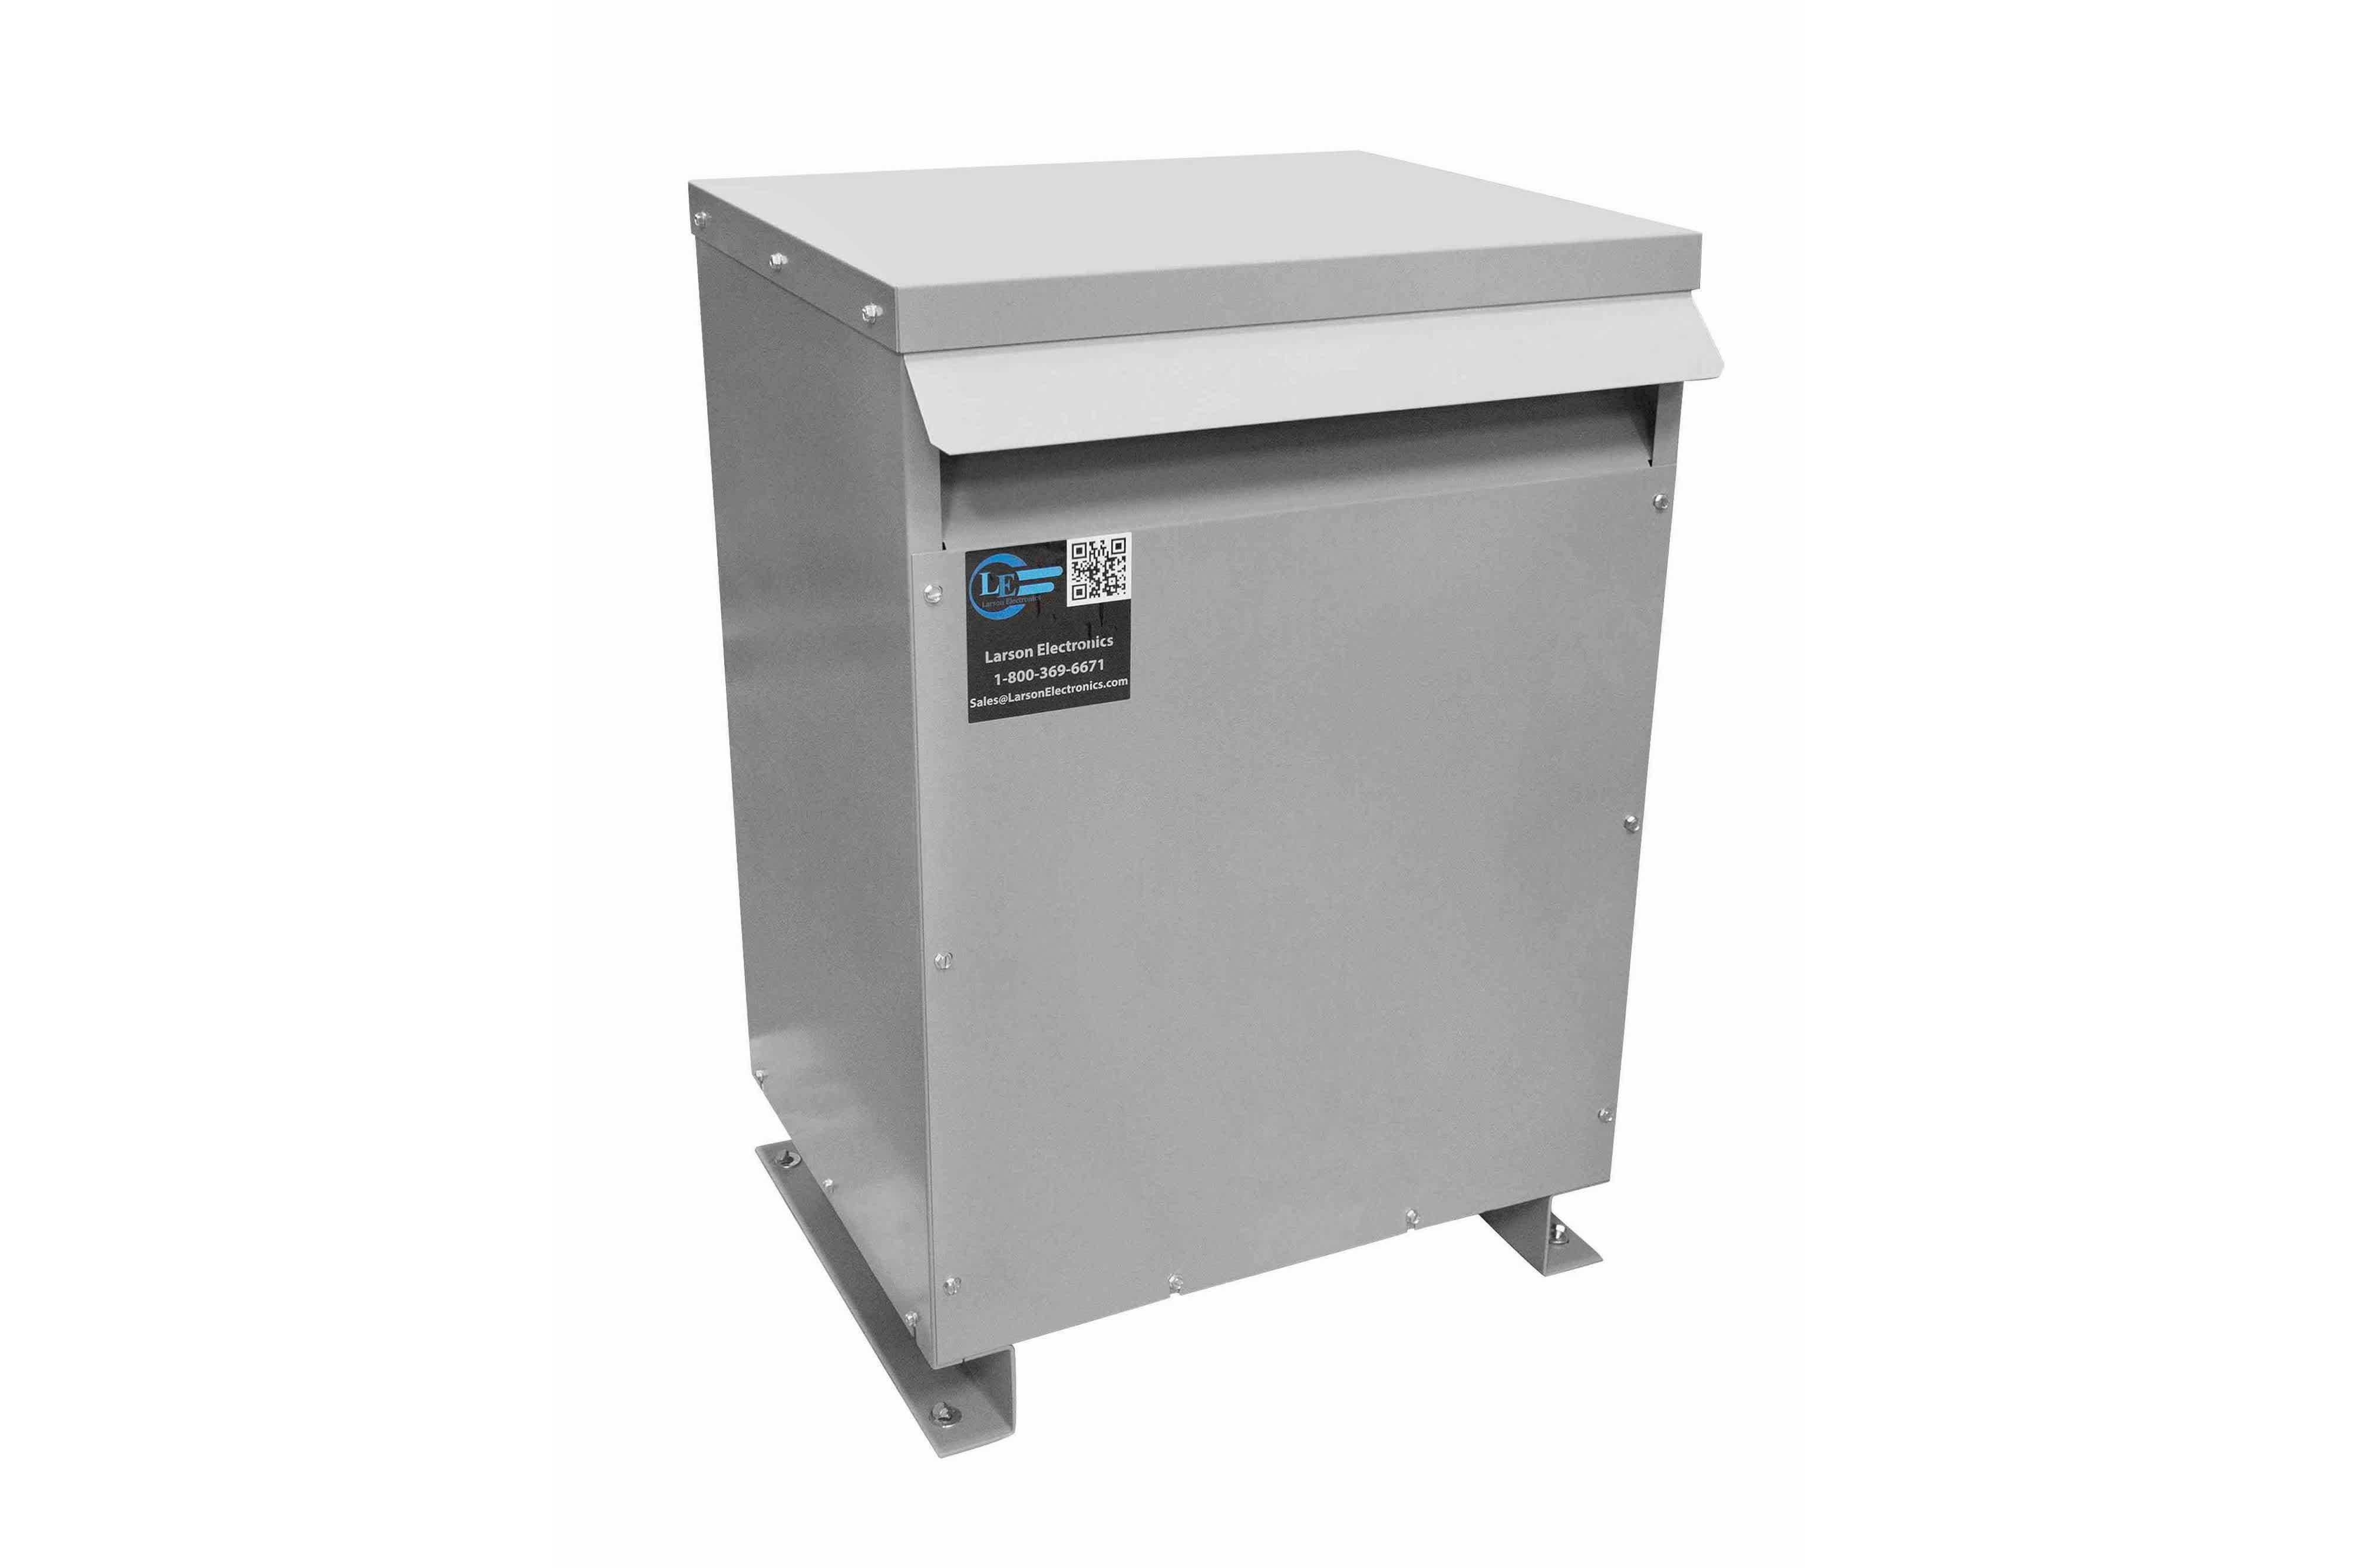 40 kVA 3PH Isolation Transformer, 415V Wye Primary, 480V Delta Secondary, N3R, Ventilated, 60 Hz